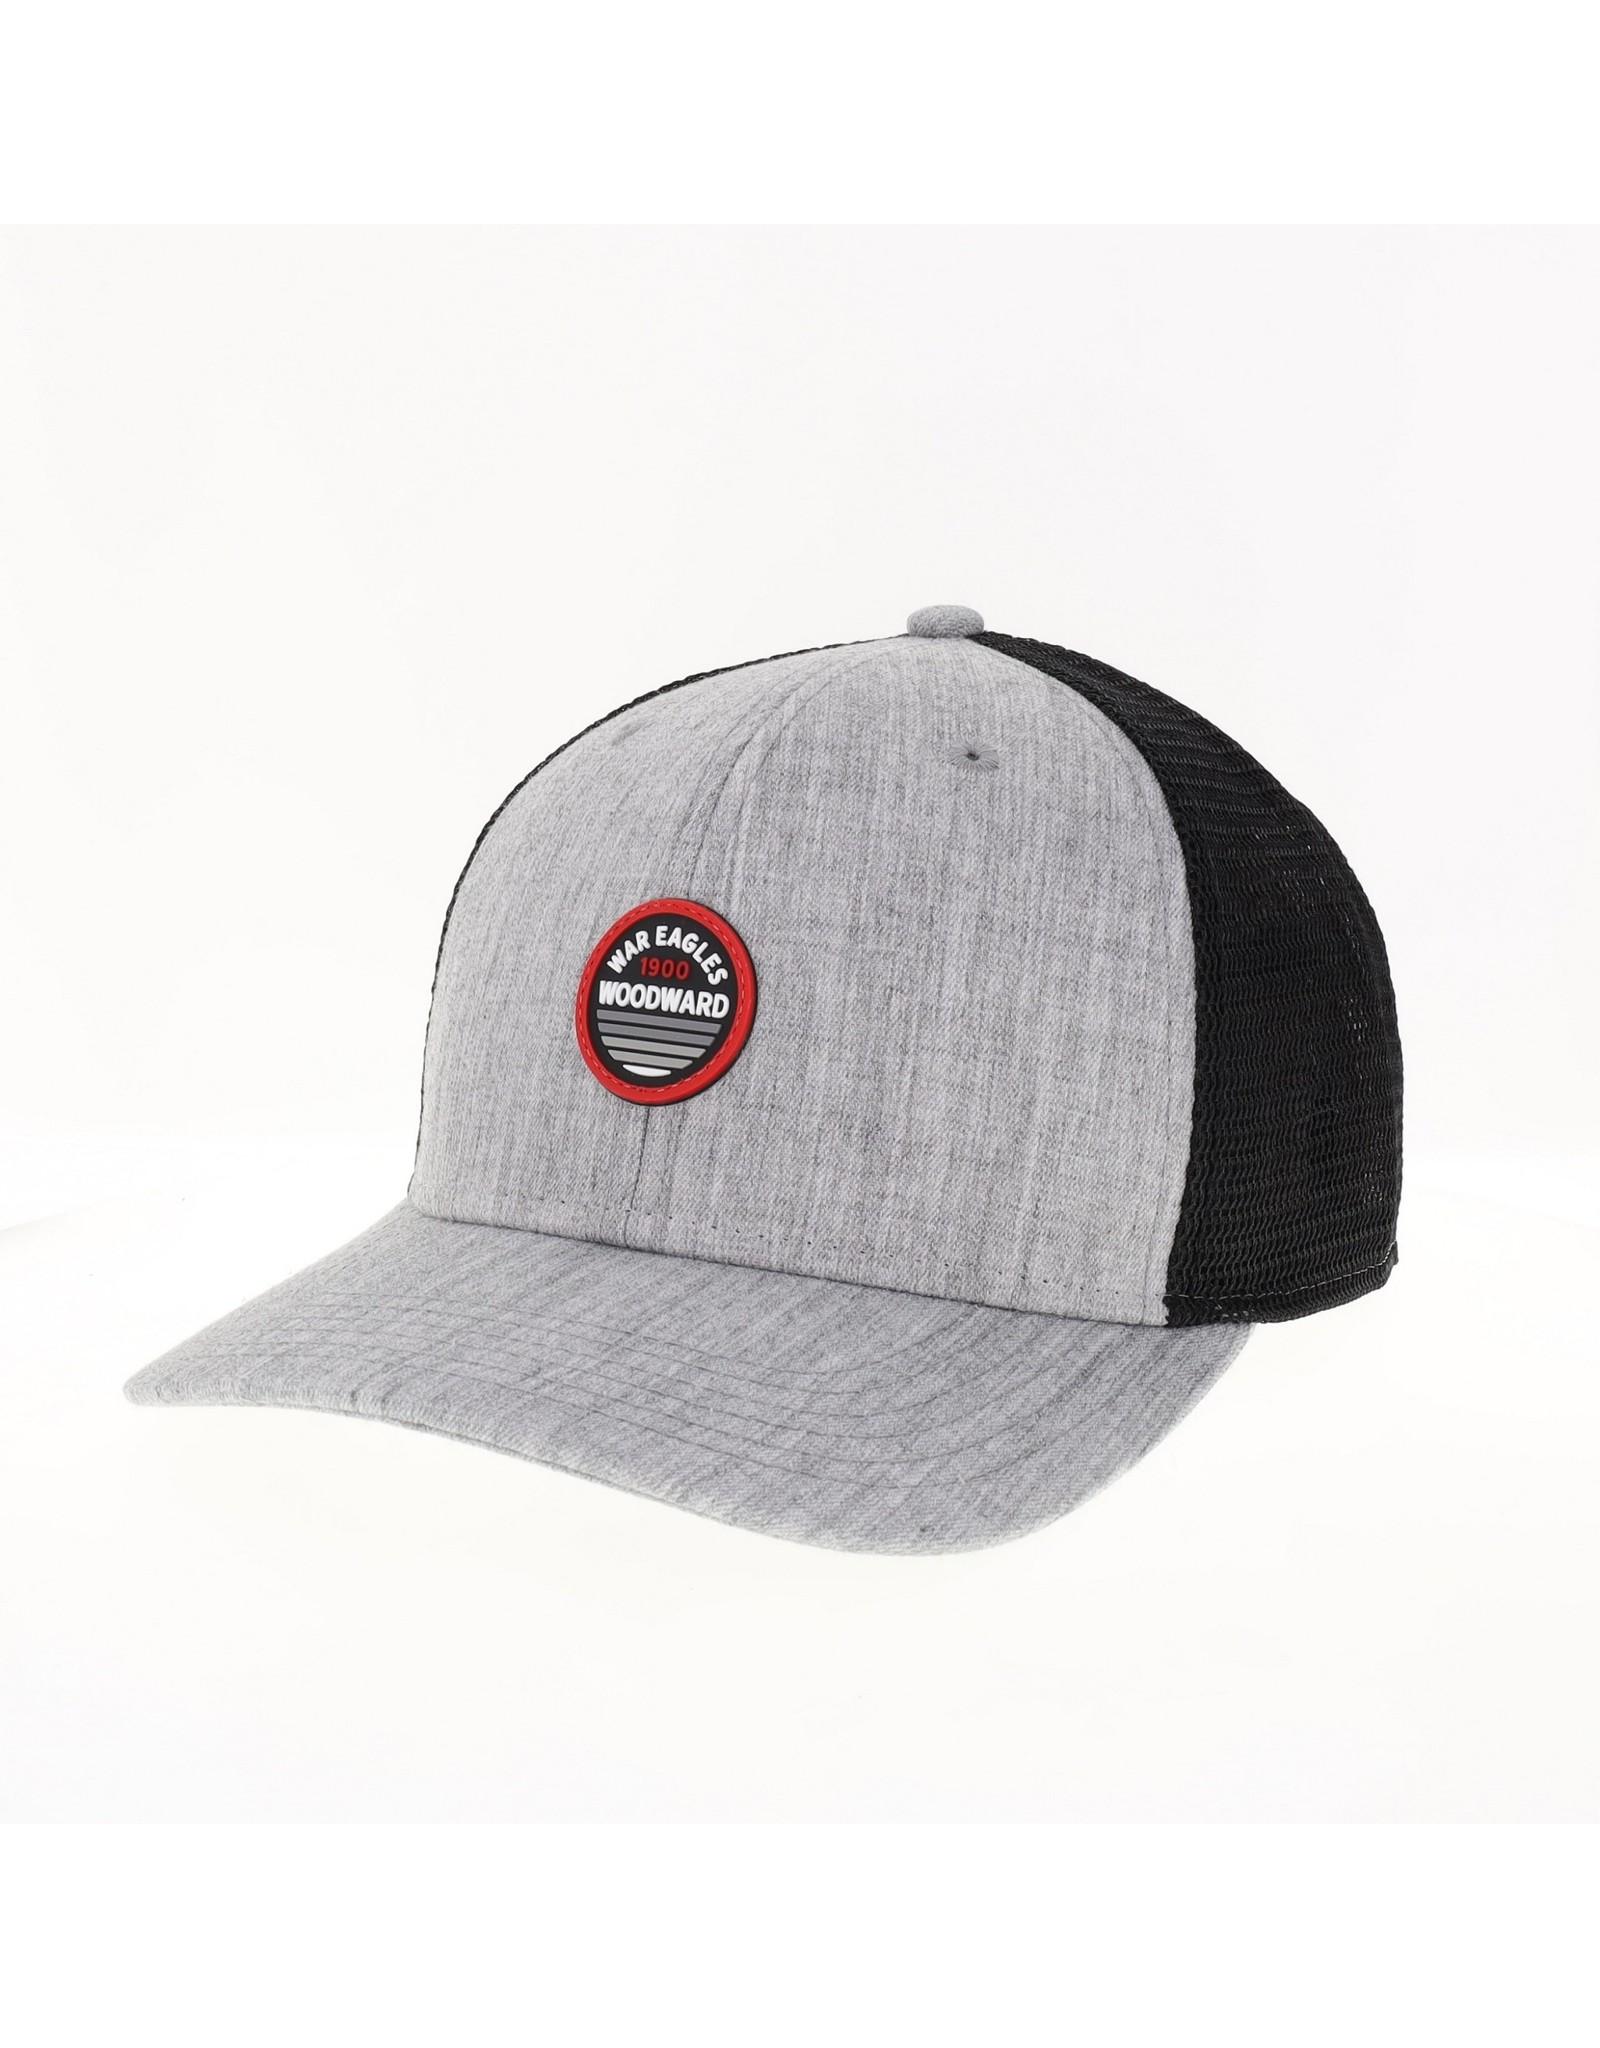 Legacy Mid-Pro Snapback Trucker Cap in Malange Grey & Black